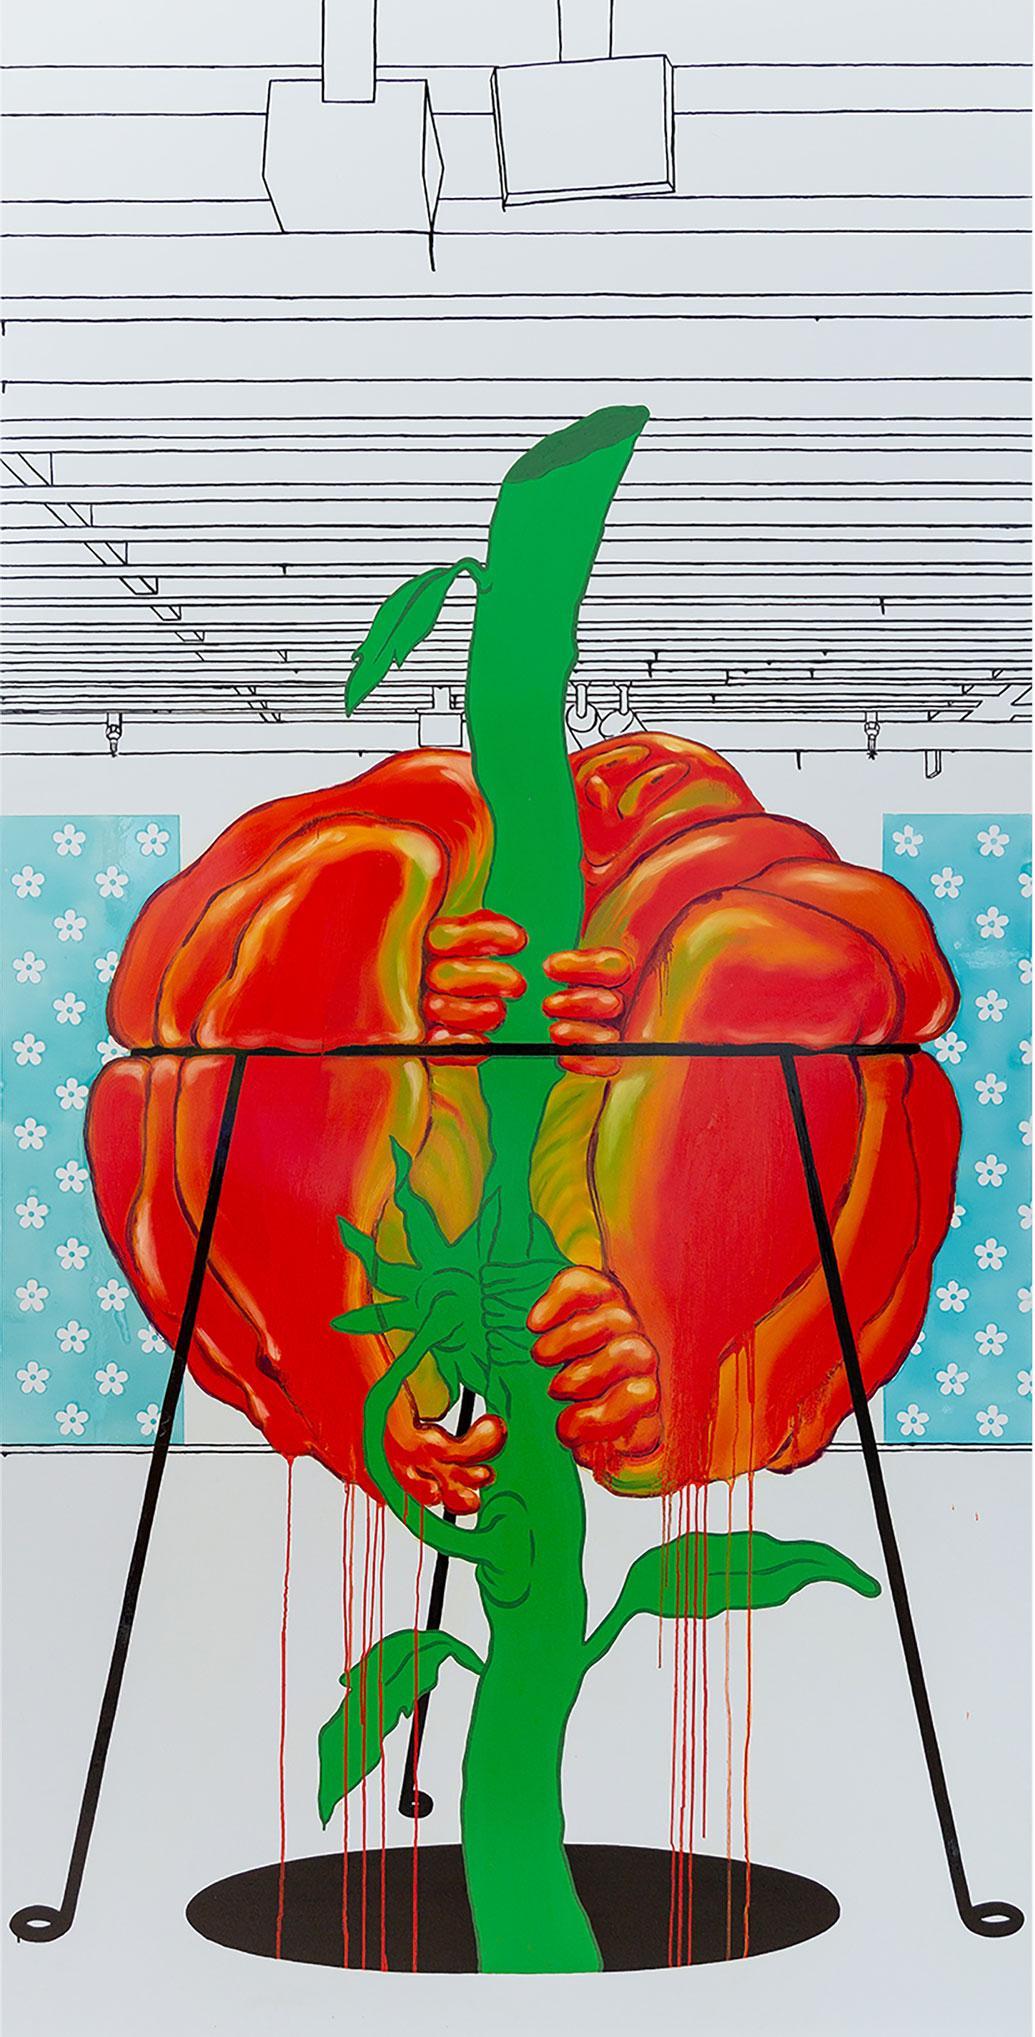 Ebecho Muslimova, Fatebe Heirloom, 2020, enamel on Dibond aluminium, 2.5 × 2.5 m. Courtesy: the artist, Galerie Maria Bernheim, Zurich, and Magenta Plains, New York; photograph: Daniel Terna